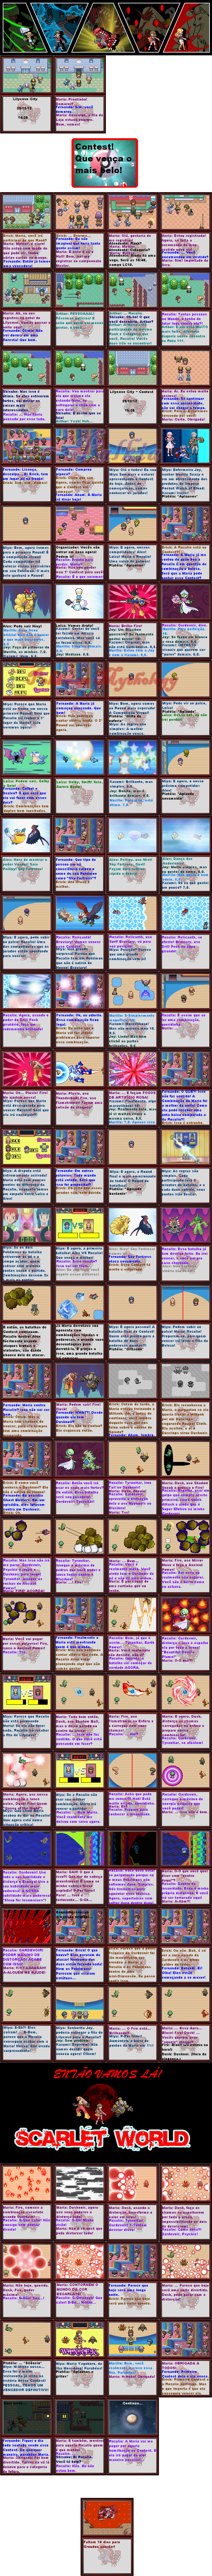 ---Pokémon - Coração de Magma!--- - Página 20 Capitulo_28_by_parukio14-d6il1o6